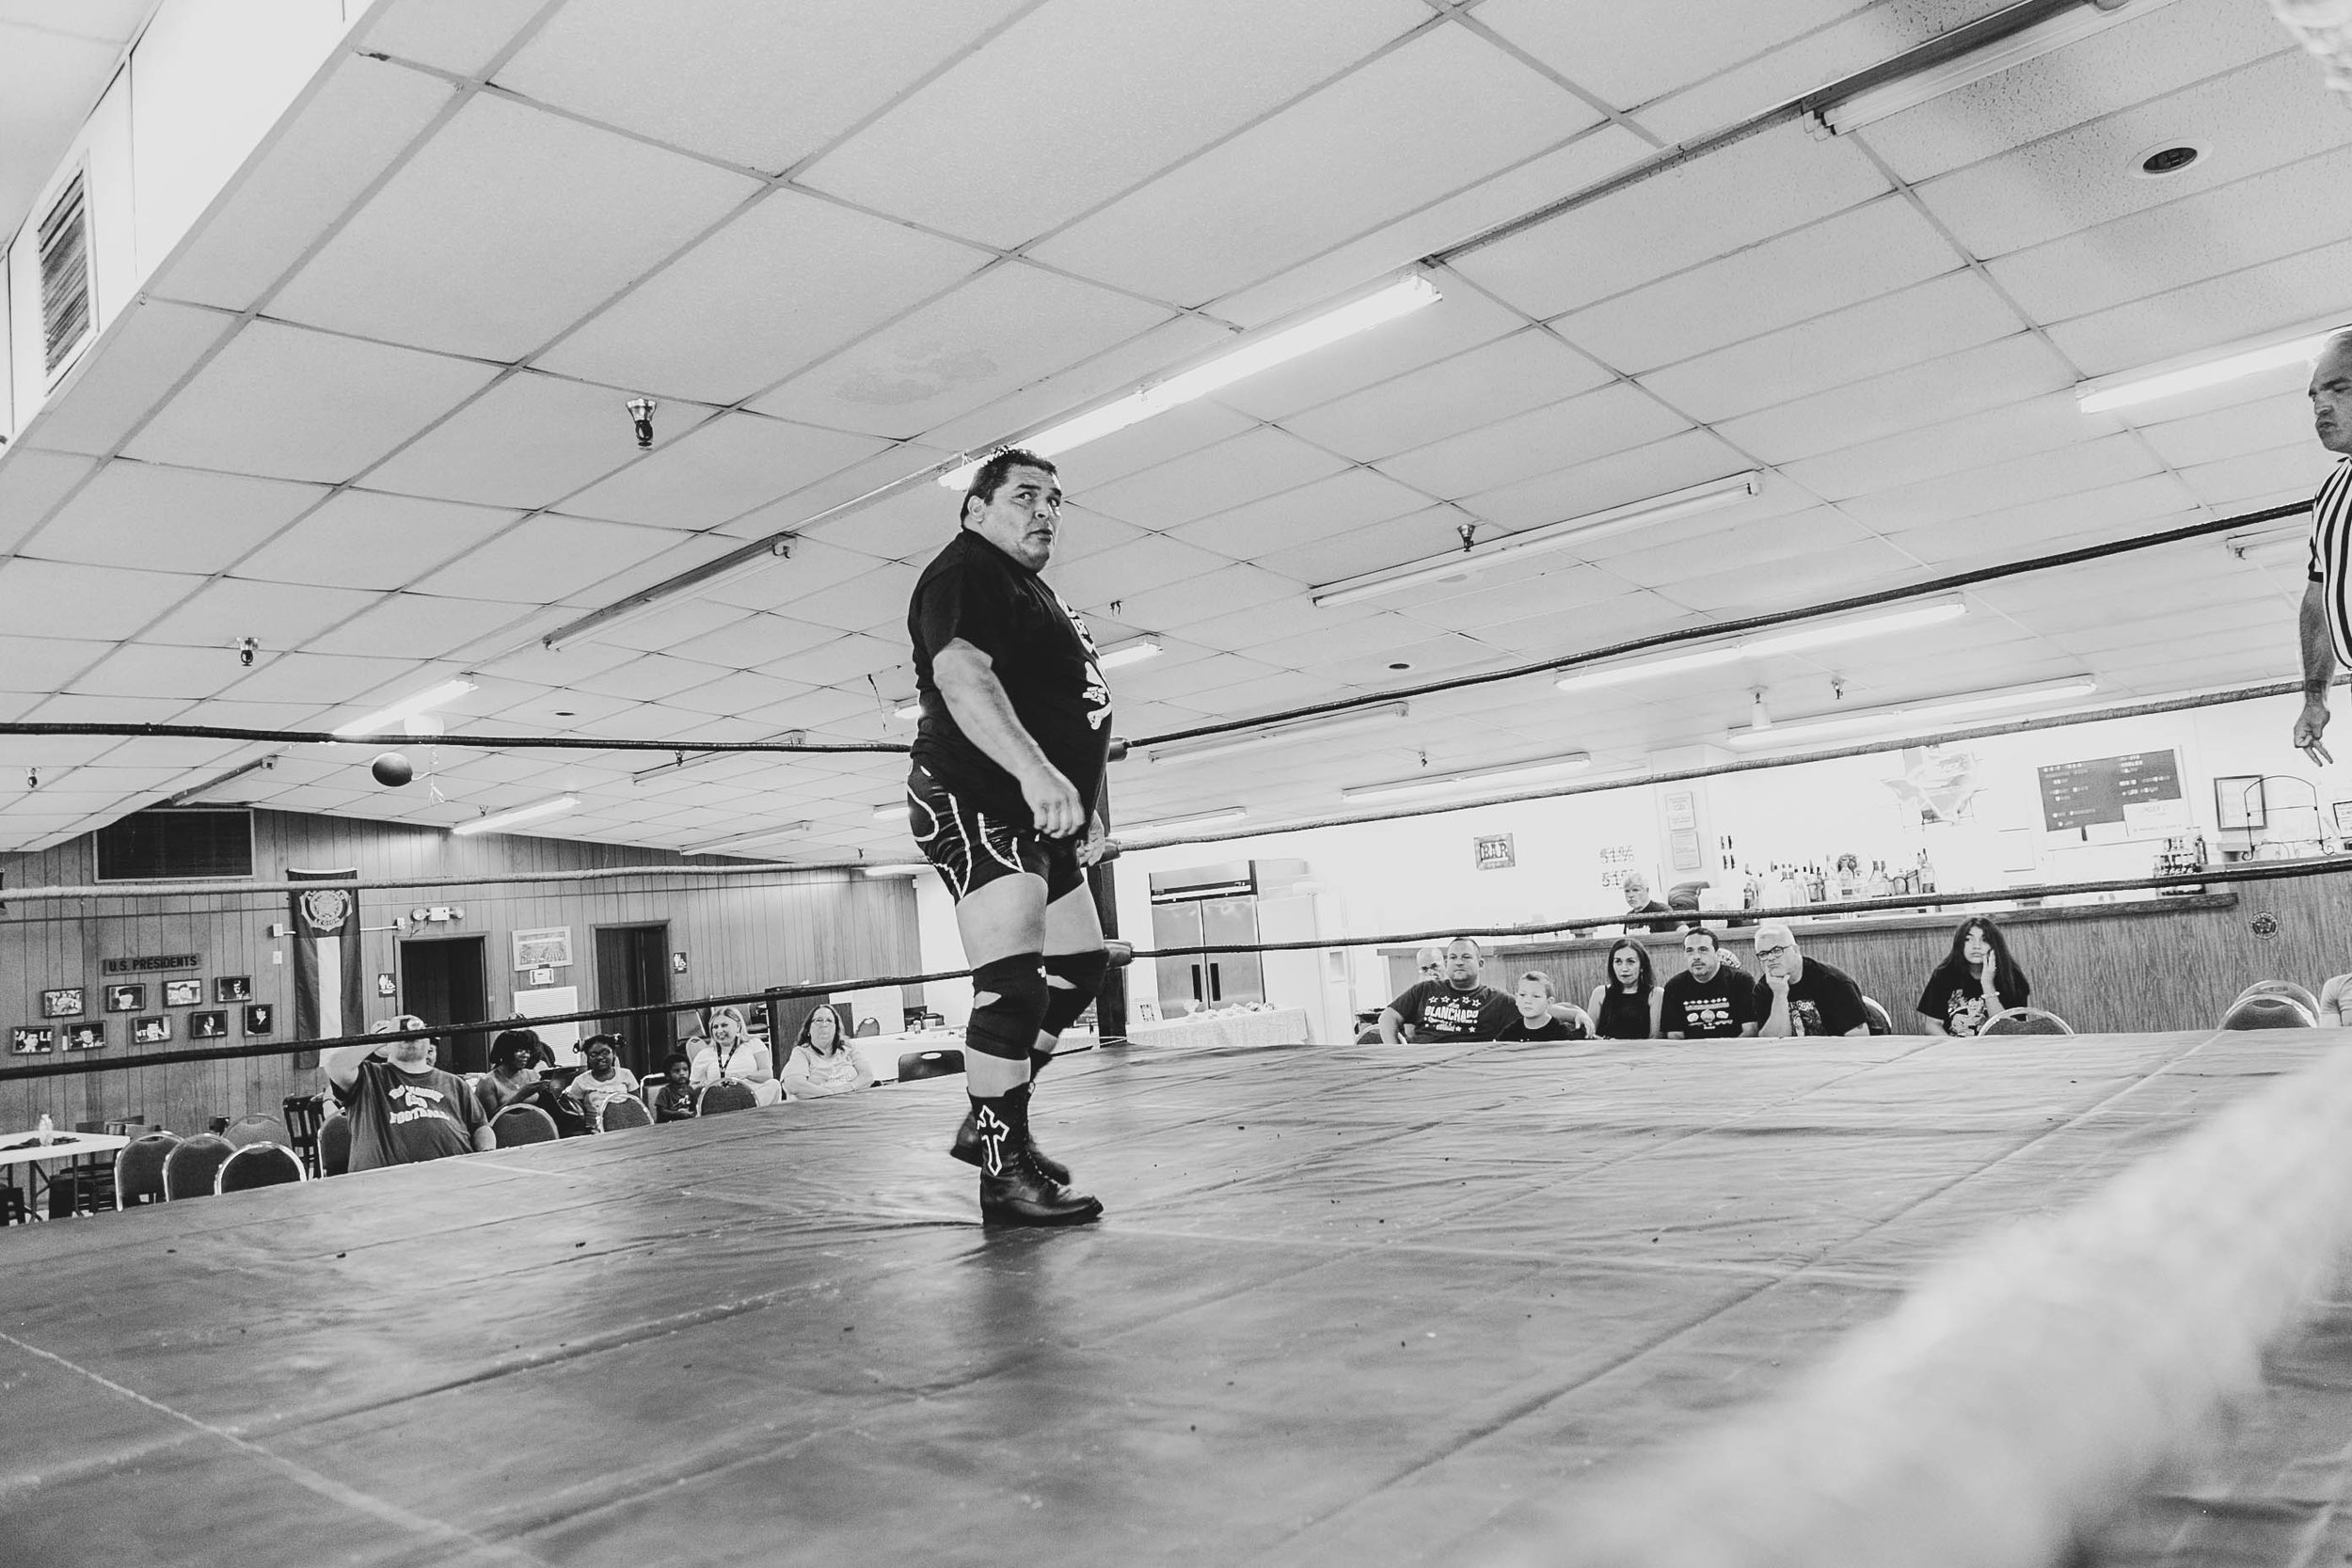 Rudy Boy Gonzalez roams the ring on Sunday. (Photo by  Luis Vazquez )